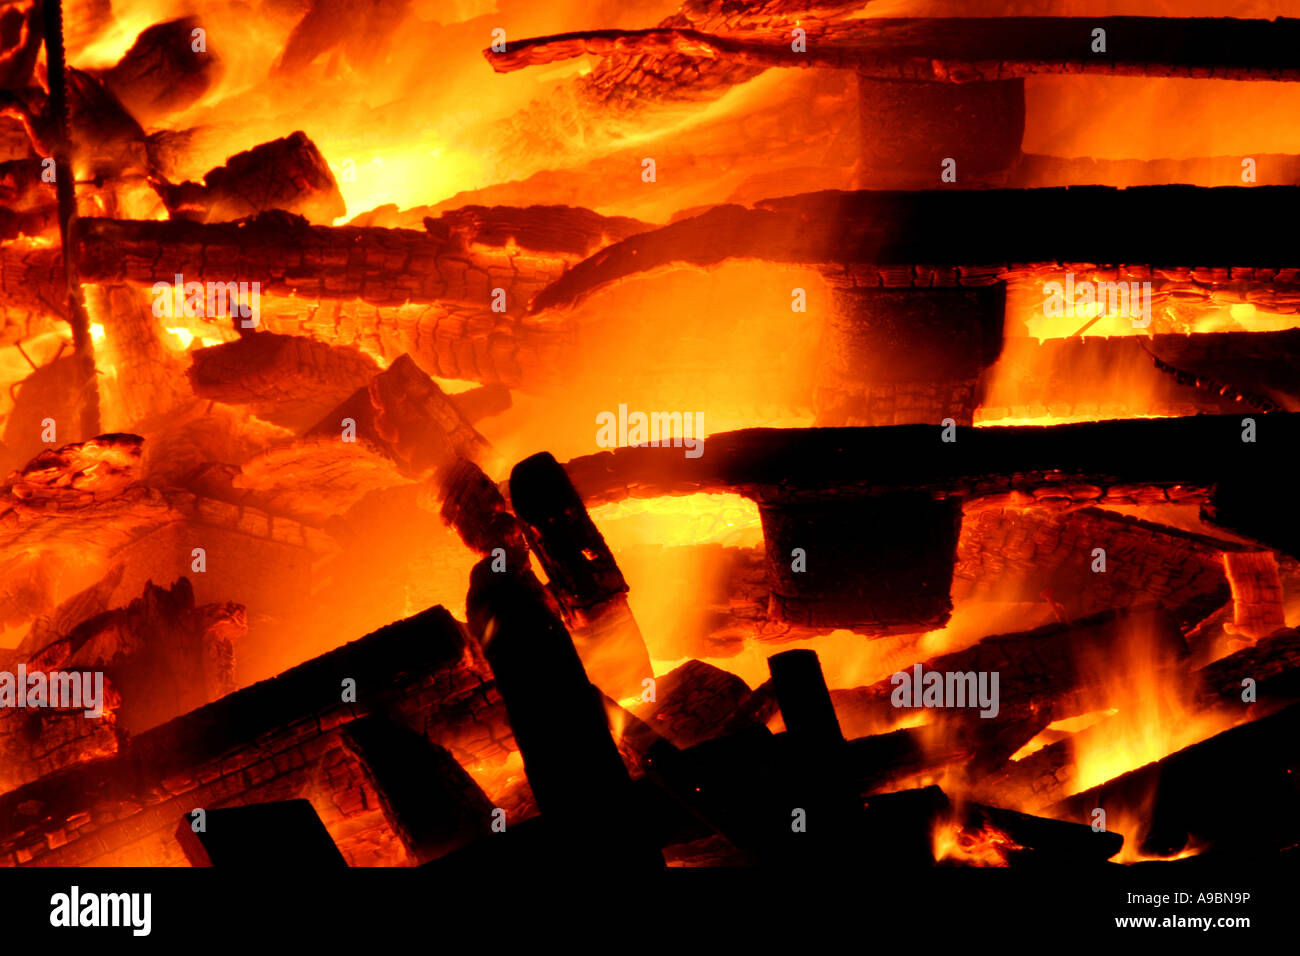 Blazing inferno shot at a bonfire - Stock Image